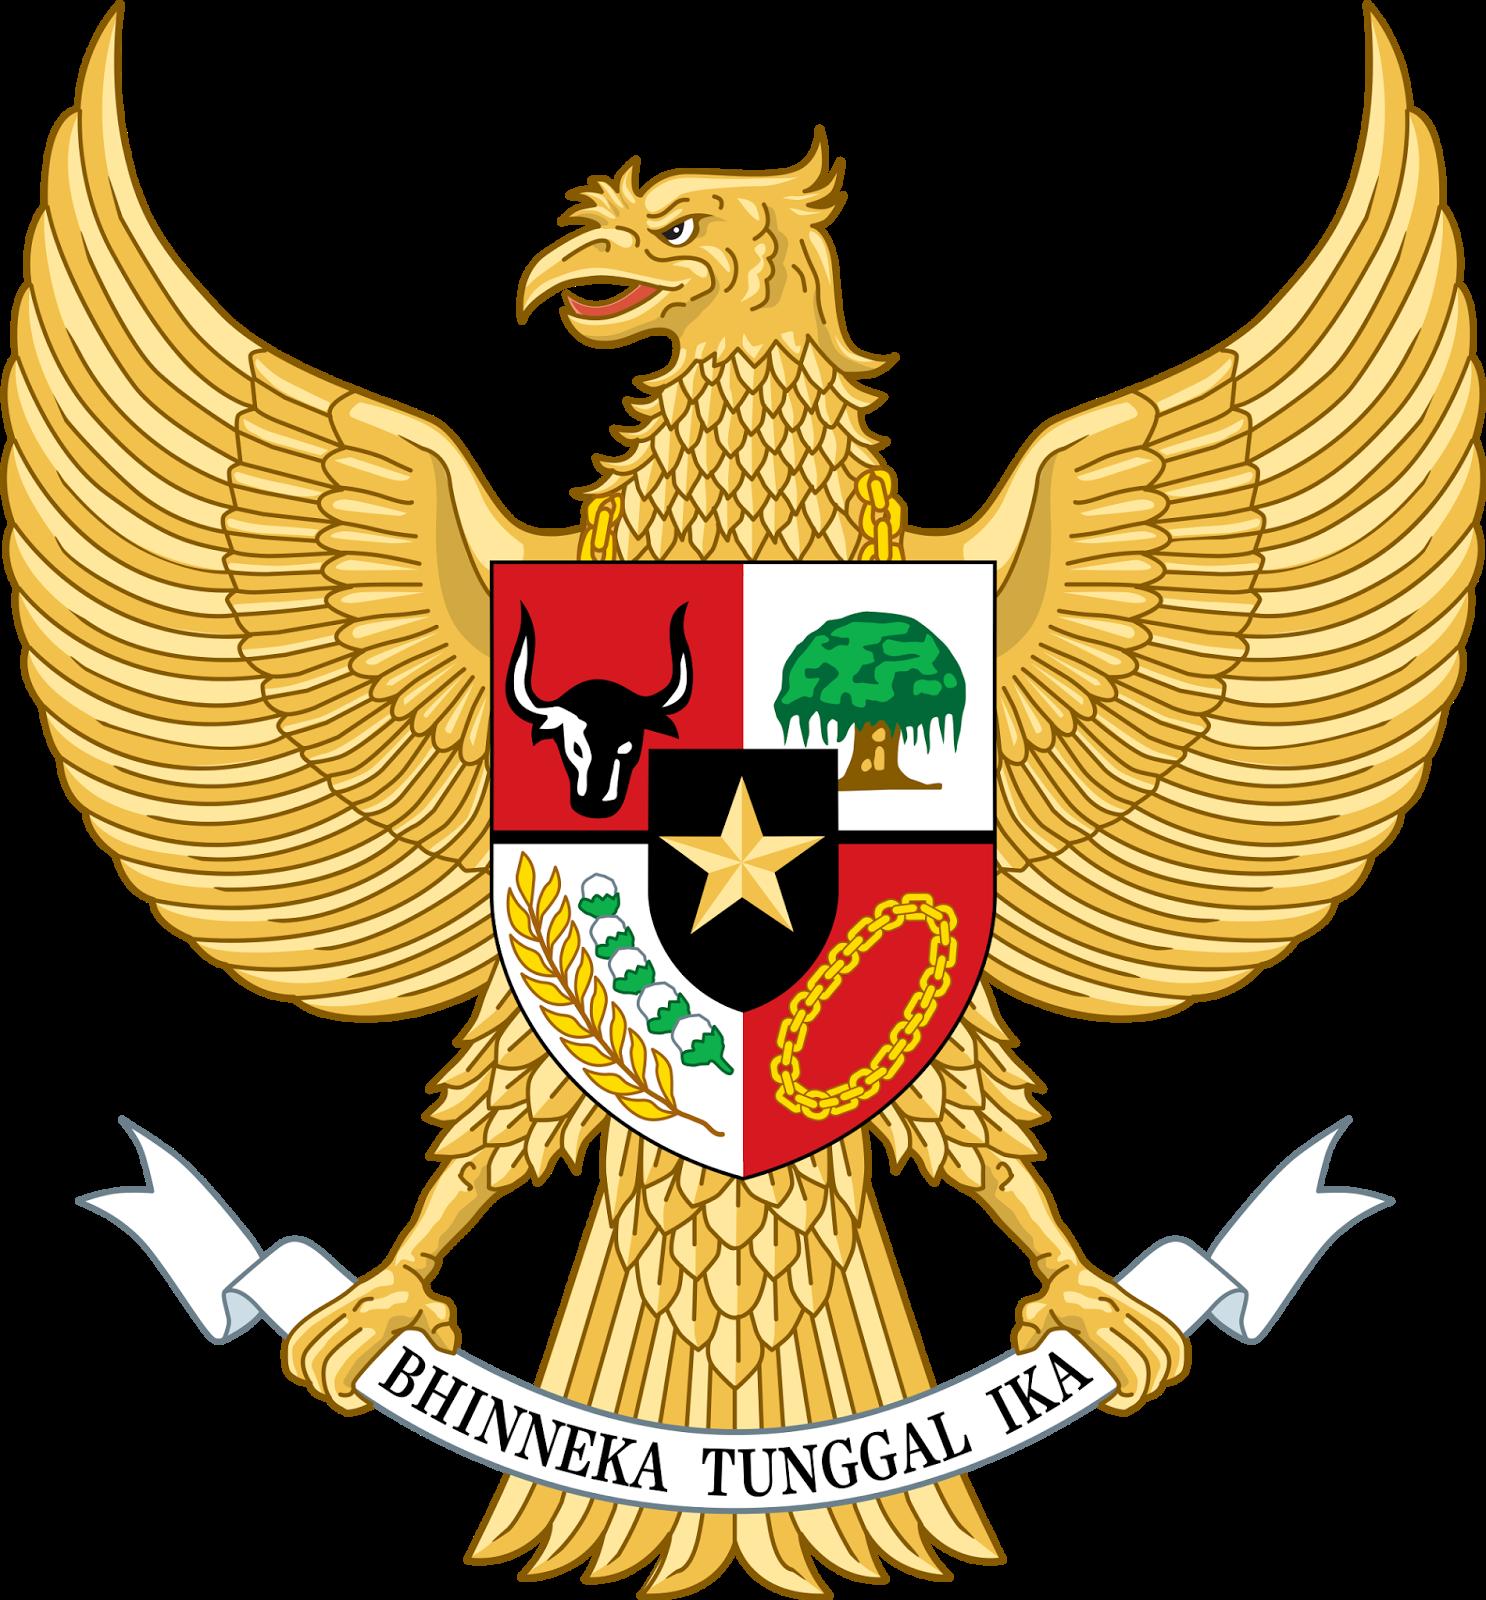 gambar garuda pancasila indonesia - gambar binatang - gambar garuda pancasila indonesia